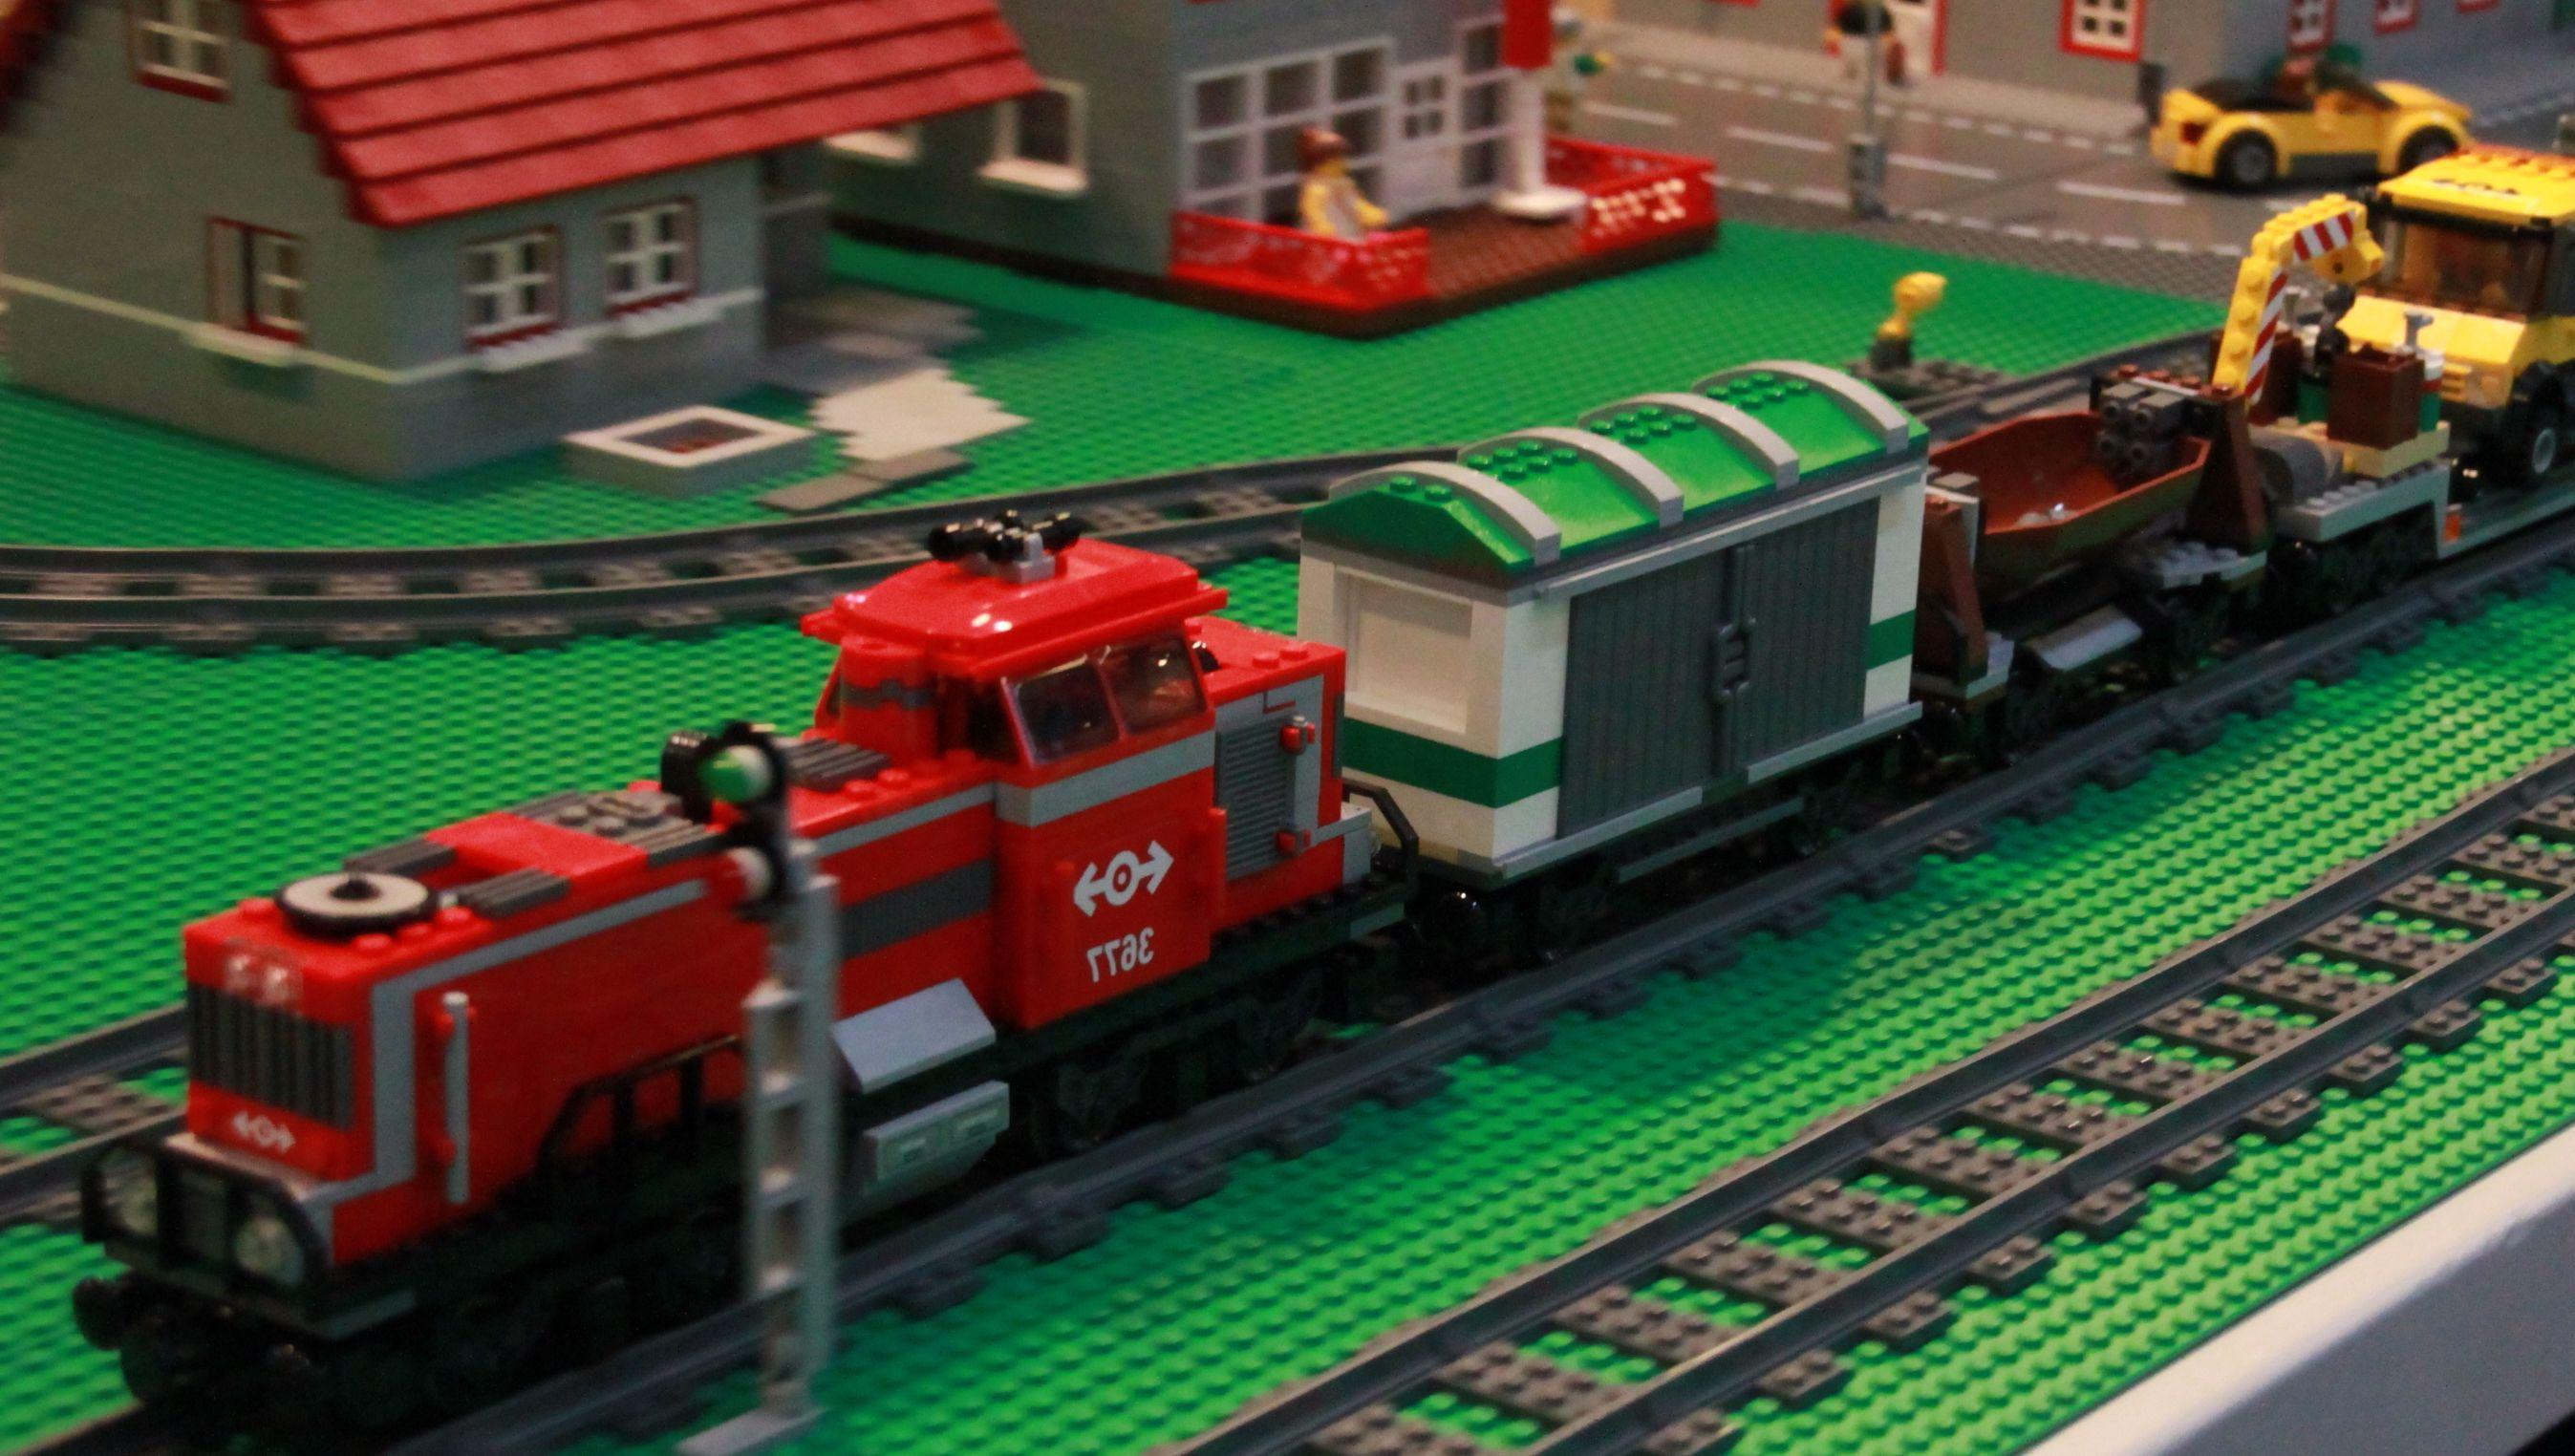 Lego 3677 City Red Cargo Train I Brick City